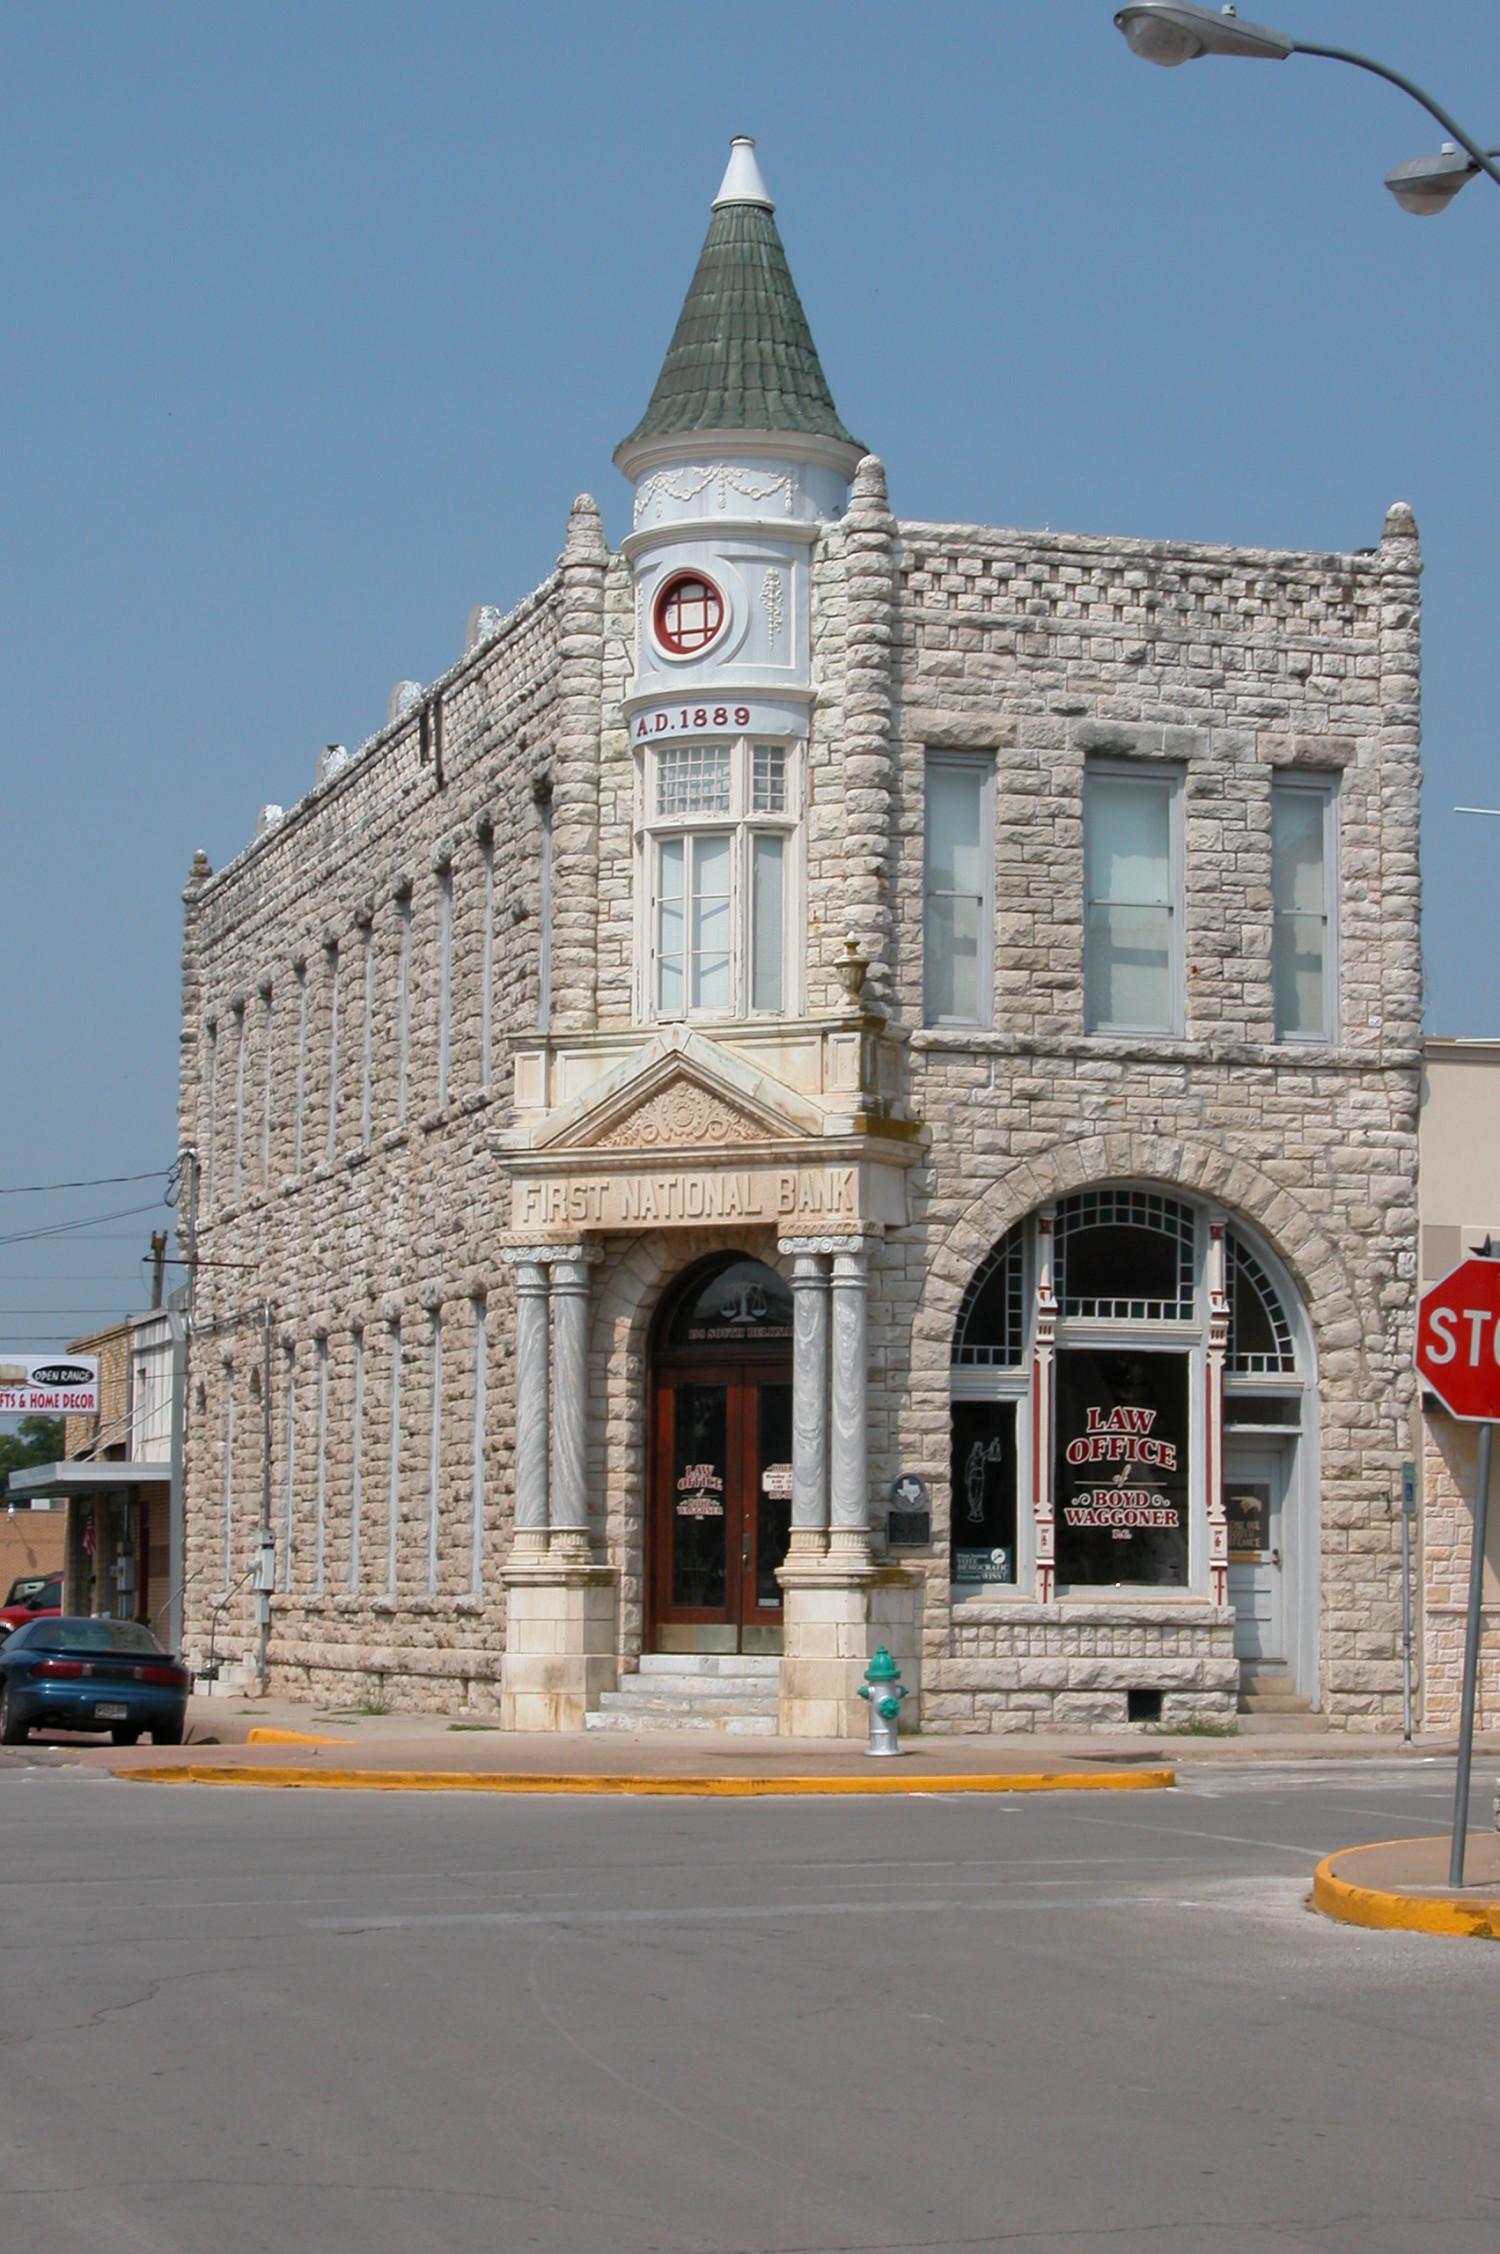 national bank of texas